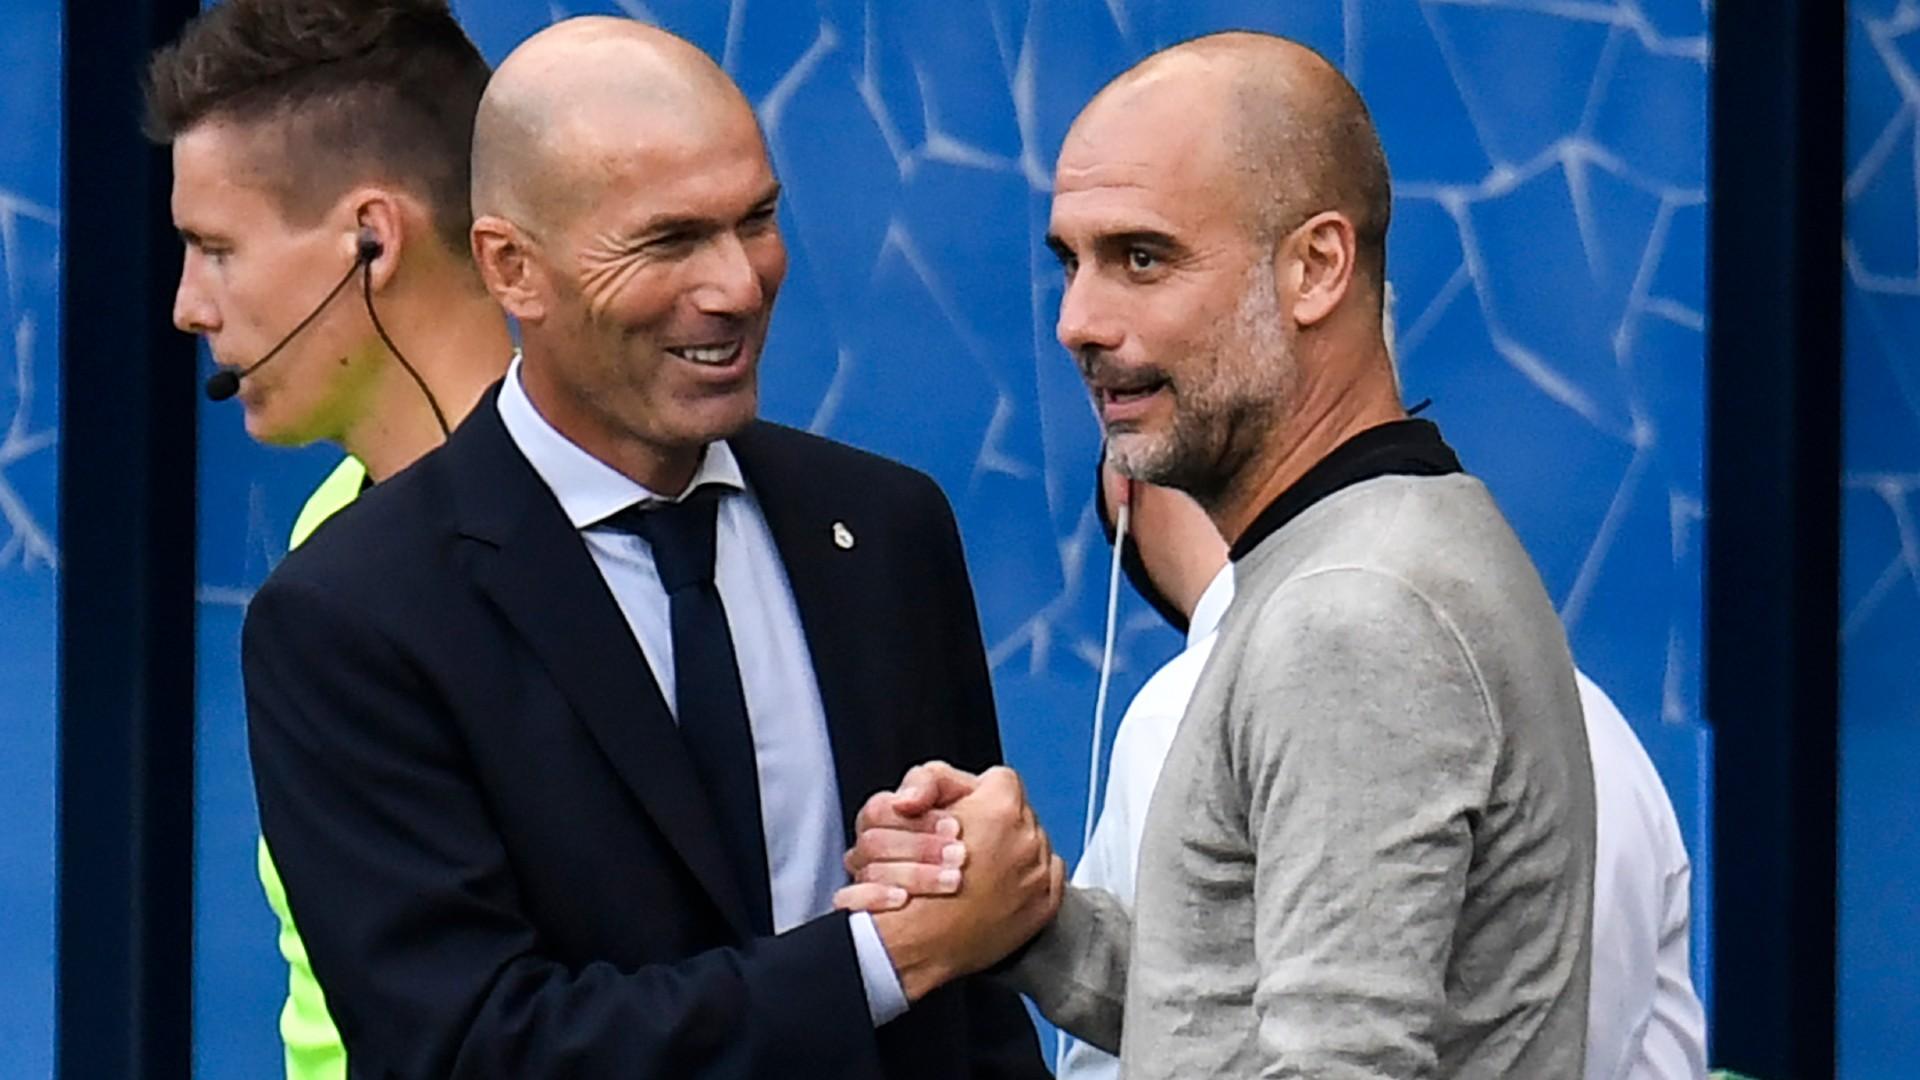 Gareth Bale is 'wasting time', claims Ramon Calderon